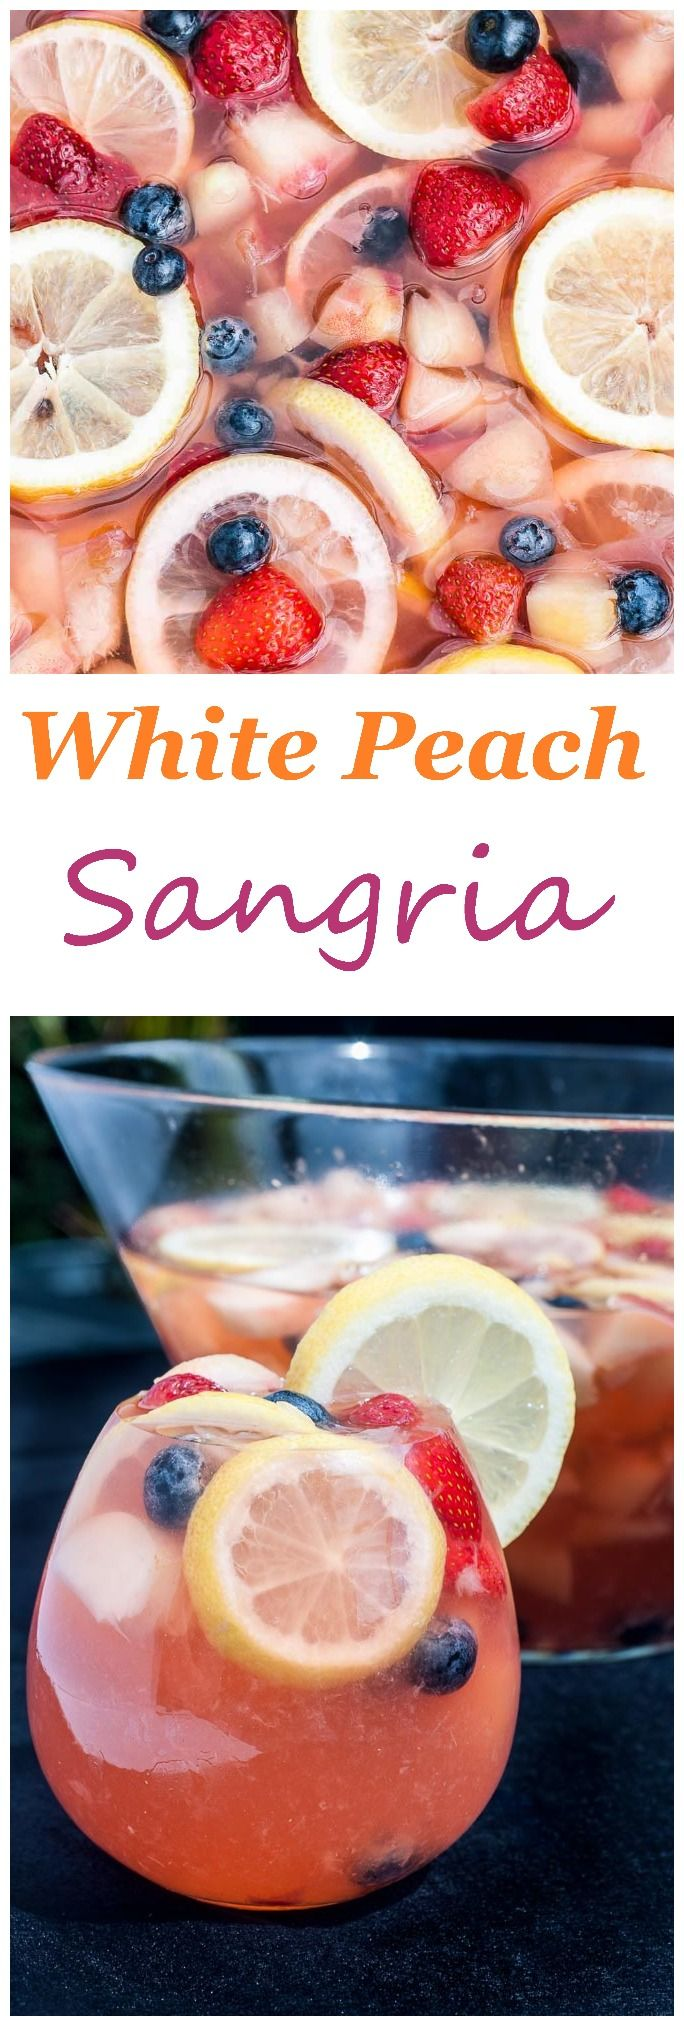 White Peach Sangria [Stir together 1/2 c brandy with 1/4 c sugar until sugar dissolves; Add 2 bottles white wine and desired fruit; Refrigerate overnight; Add soda water when served]